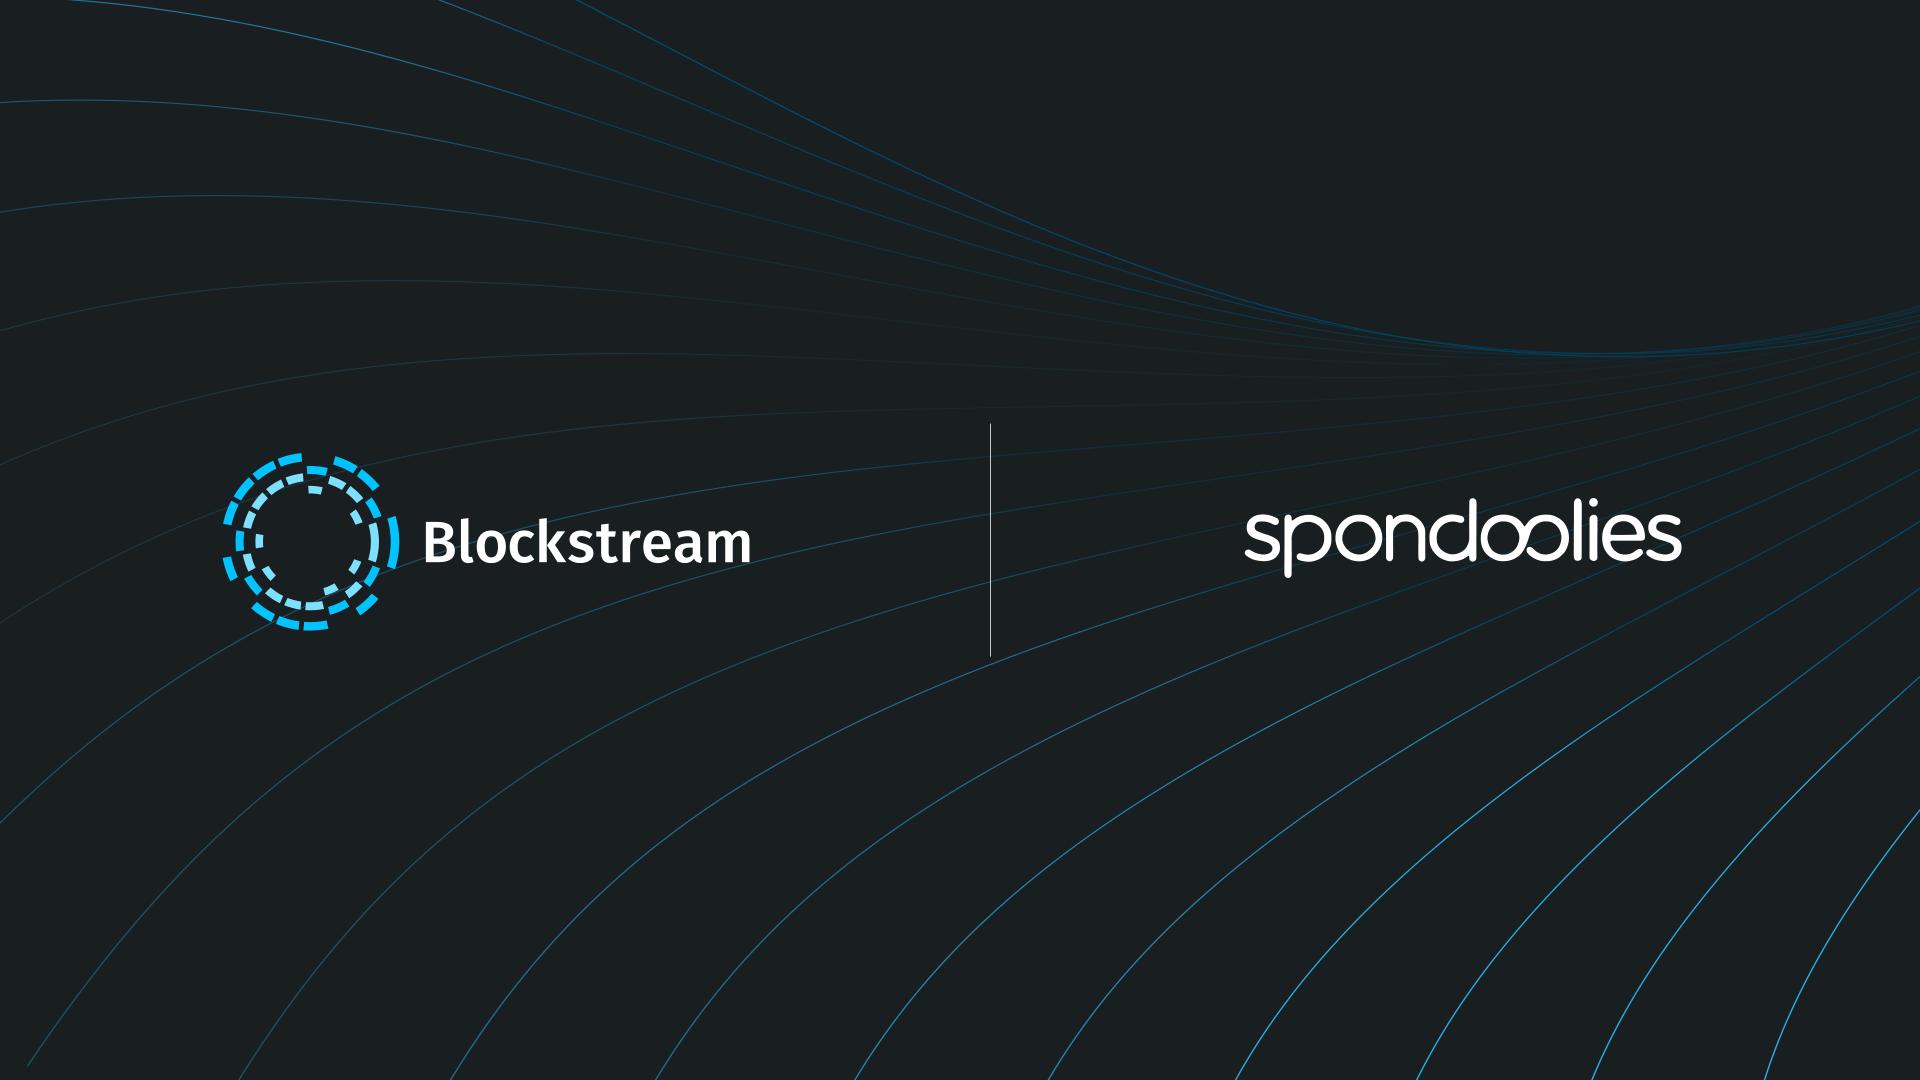 Blockstream Mining Builds Momentum with Spondoolies Acquisition